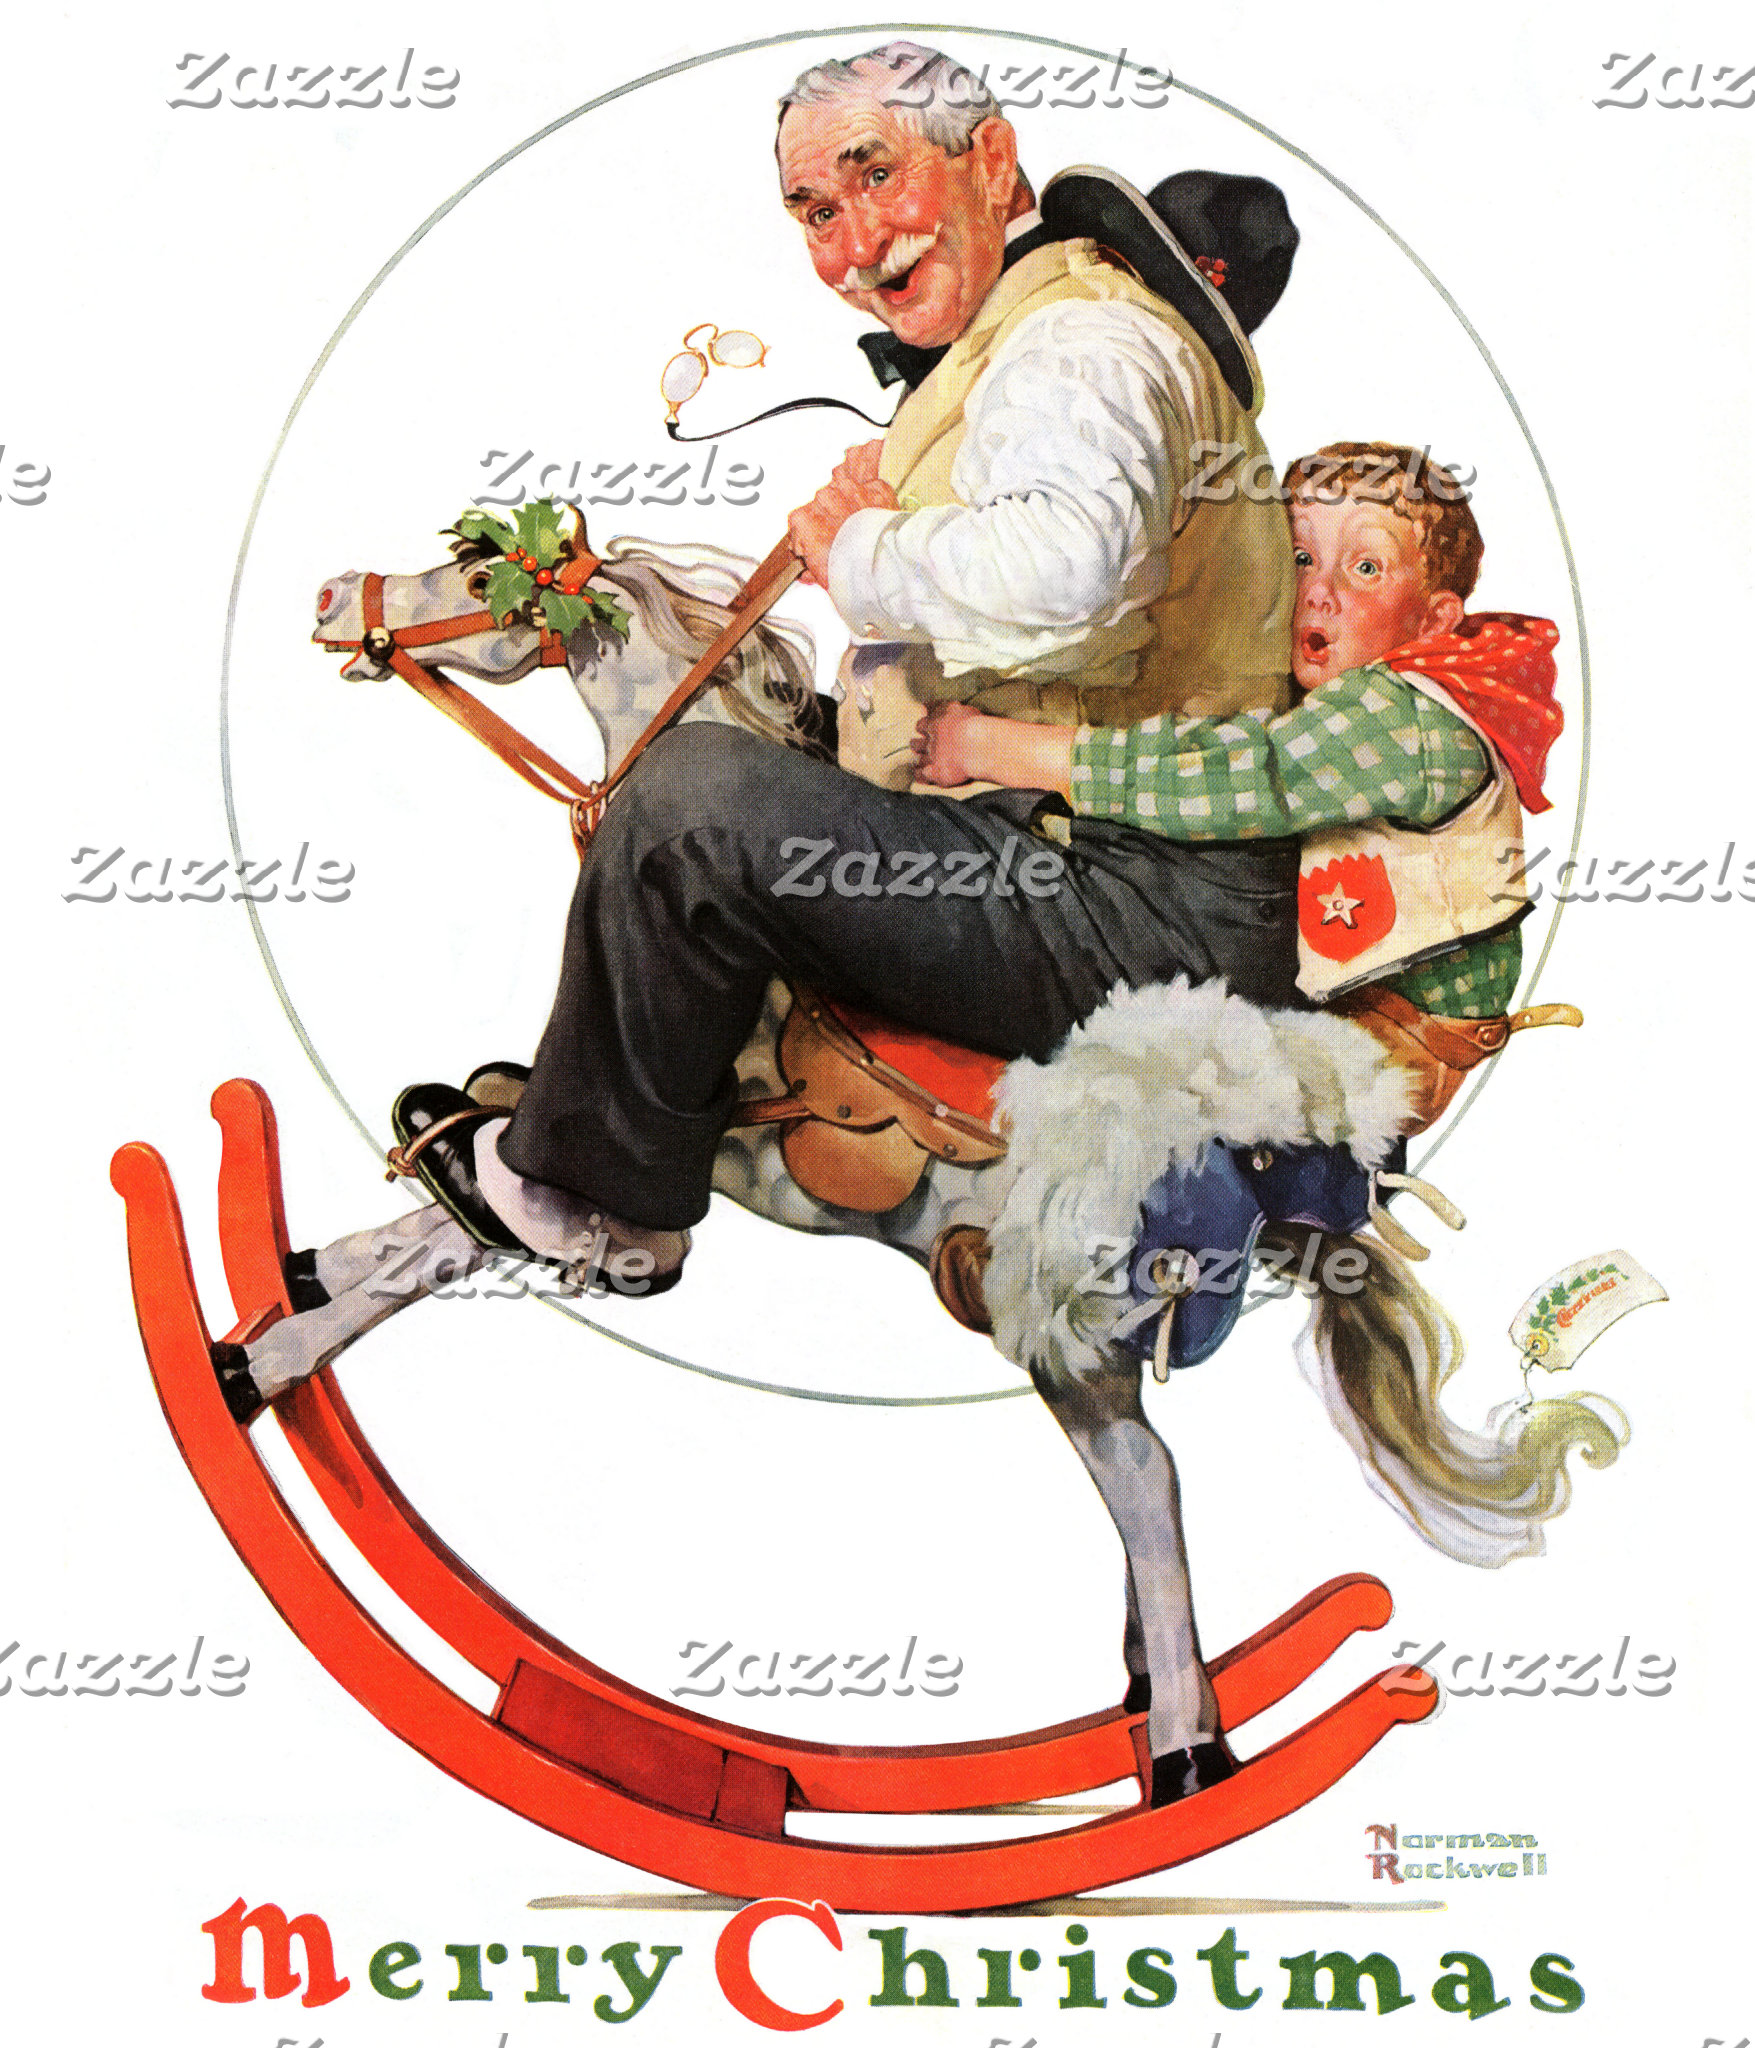 Gramps on Rocking Horse